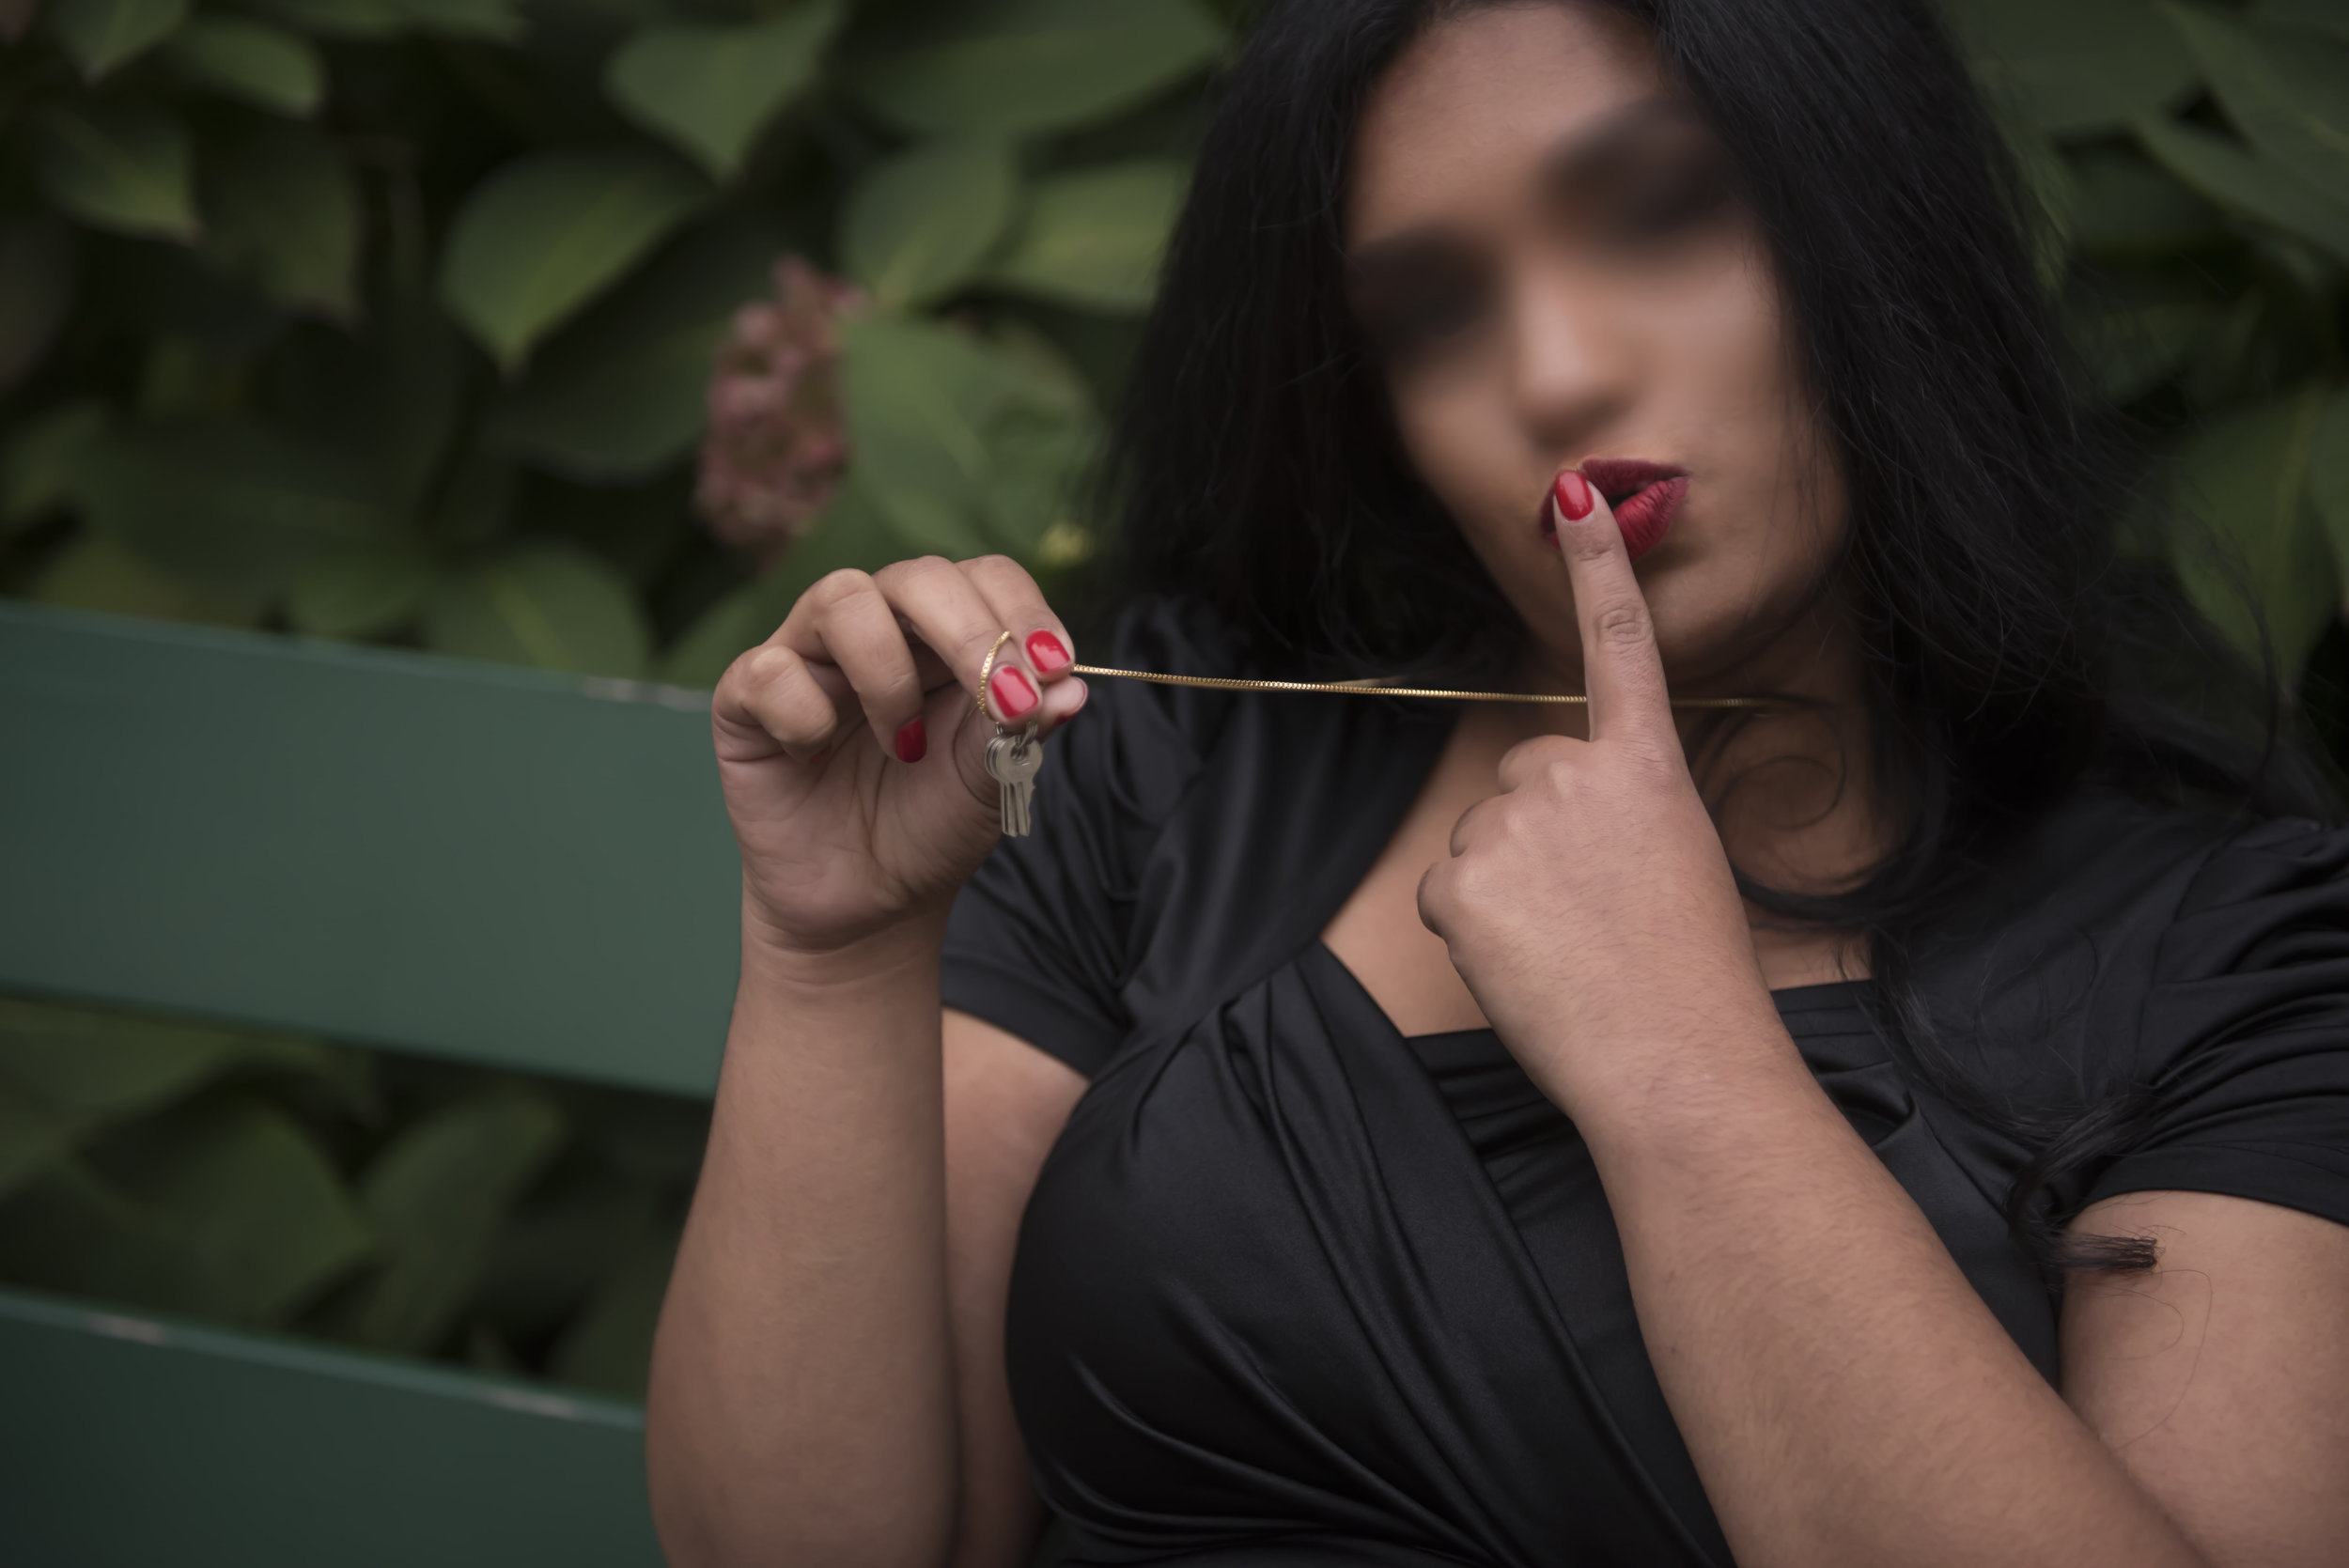 Chastity play and keyholding by East Indian Dominatrix and Escort Jasmine Praveena NYC Philadelphia, NJ, Washington DC